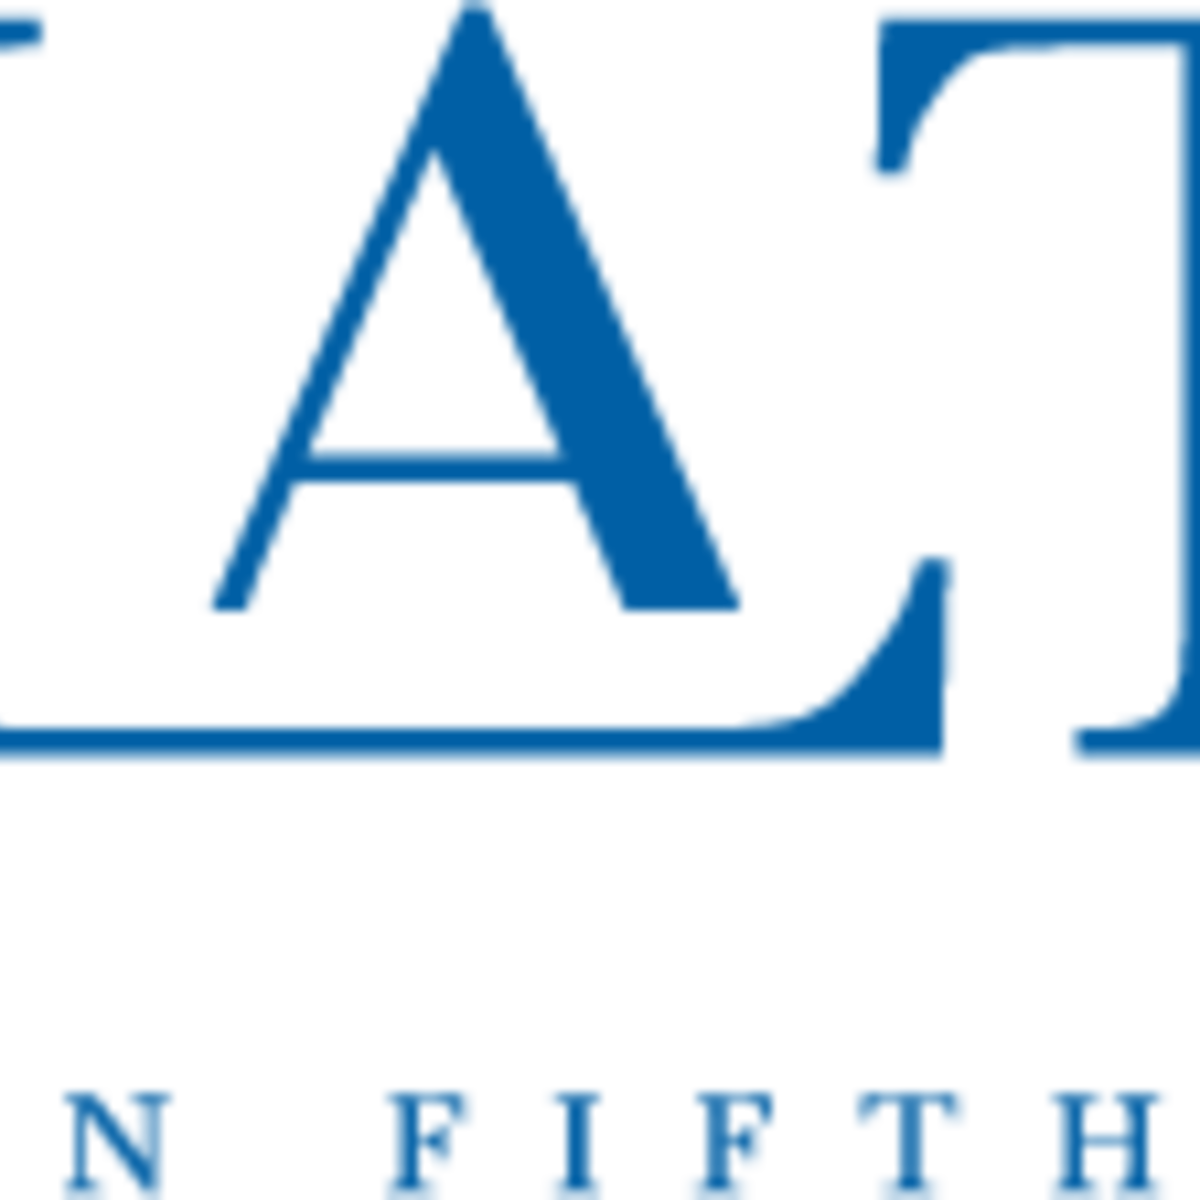 Craigs List Com Ny: Flats On 5th Des Moines, IA